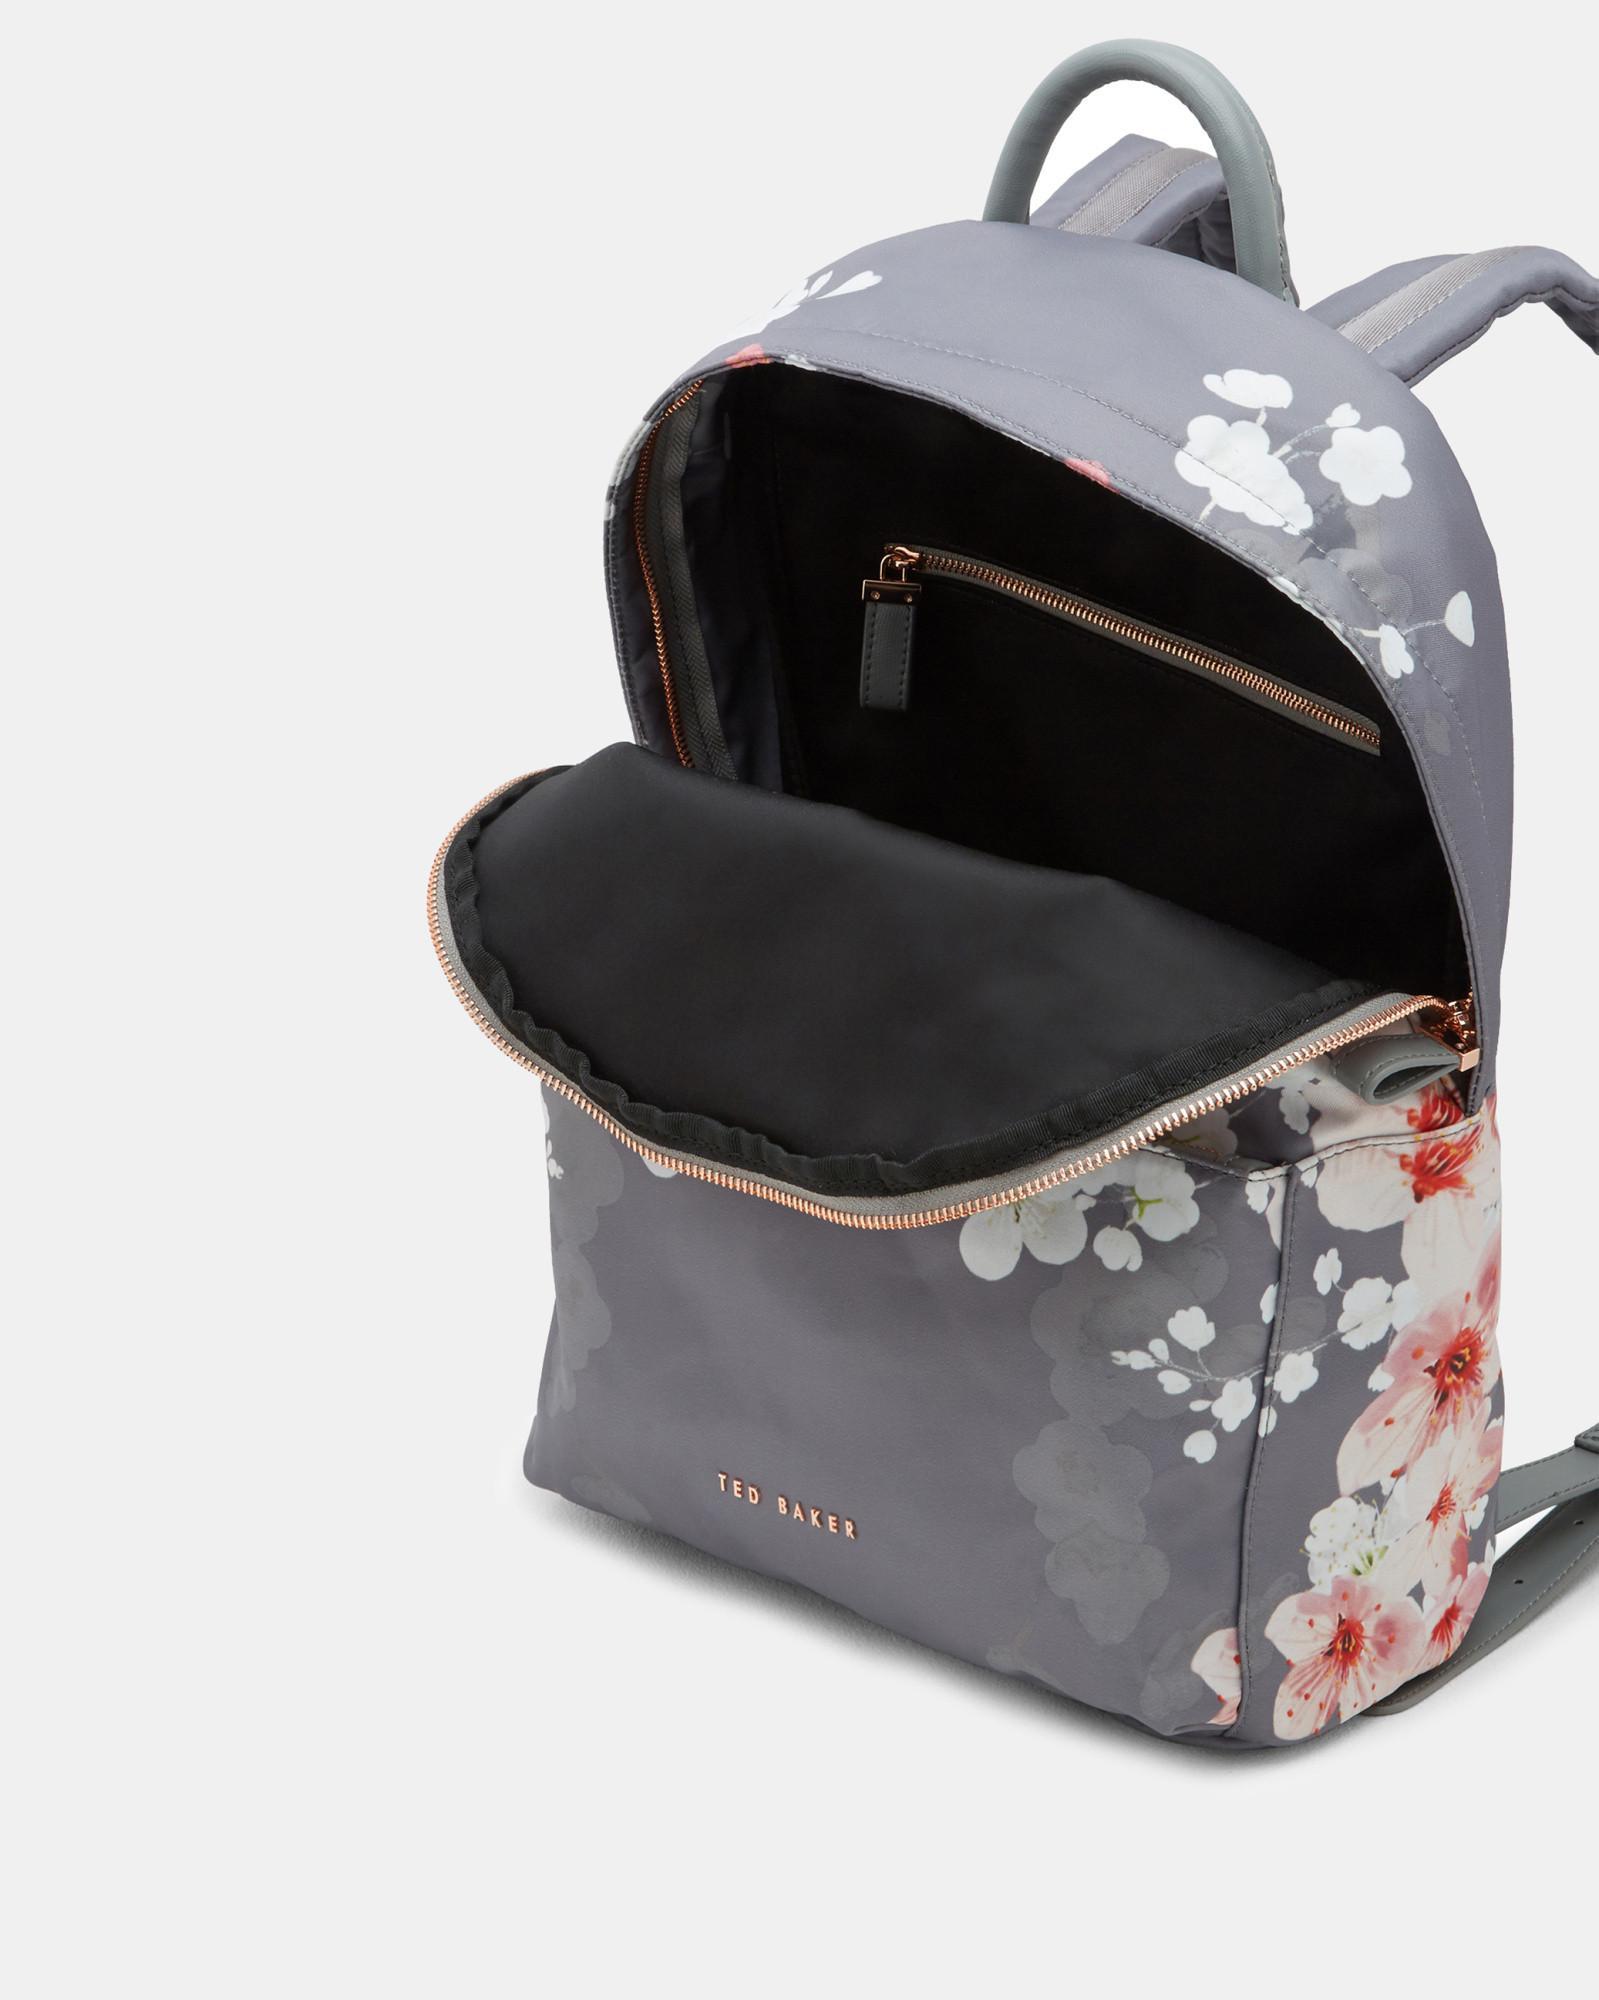 774650af1078 Ted Baker Oriental Blossom Backpack in Gray - Lyst